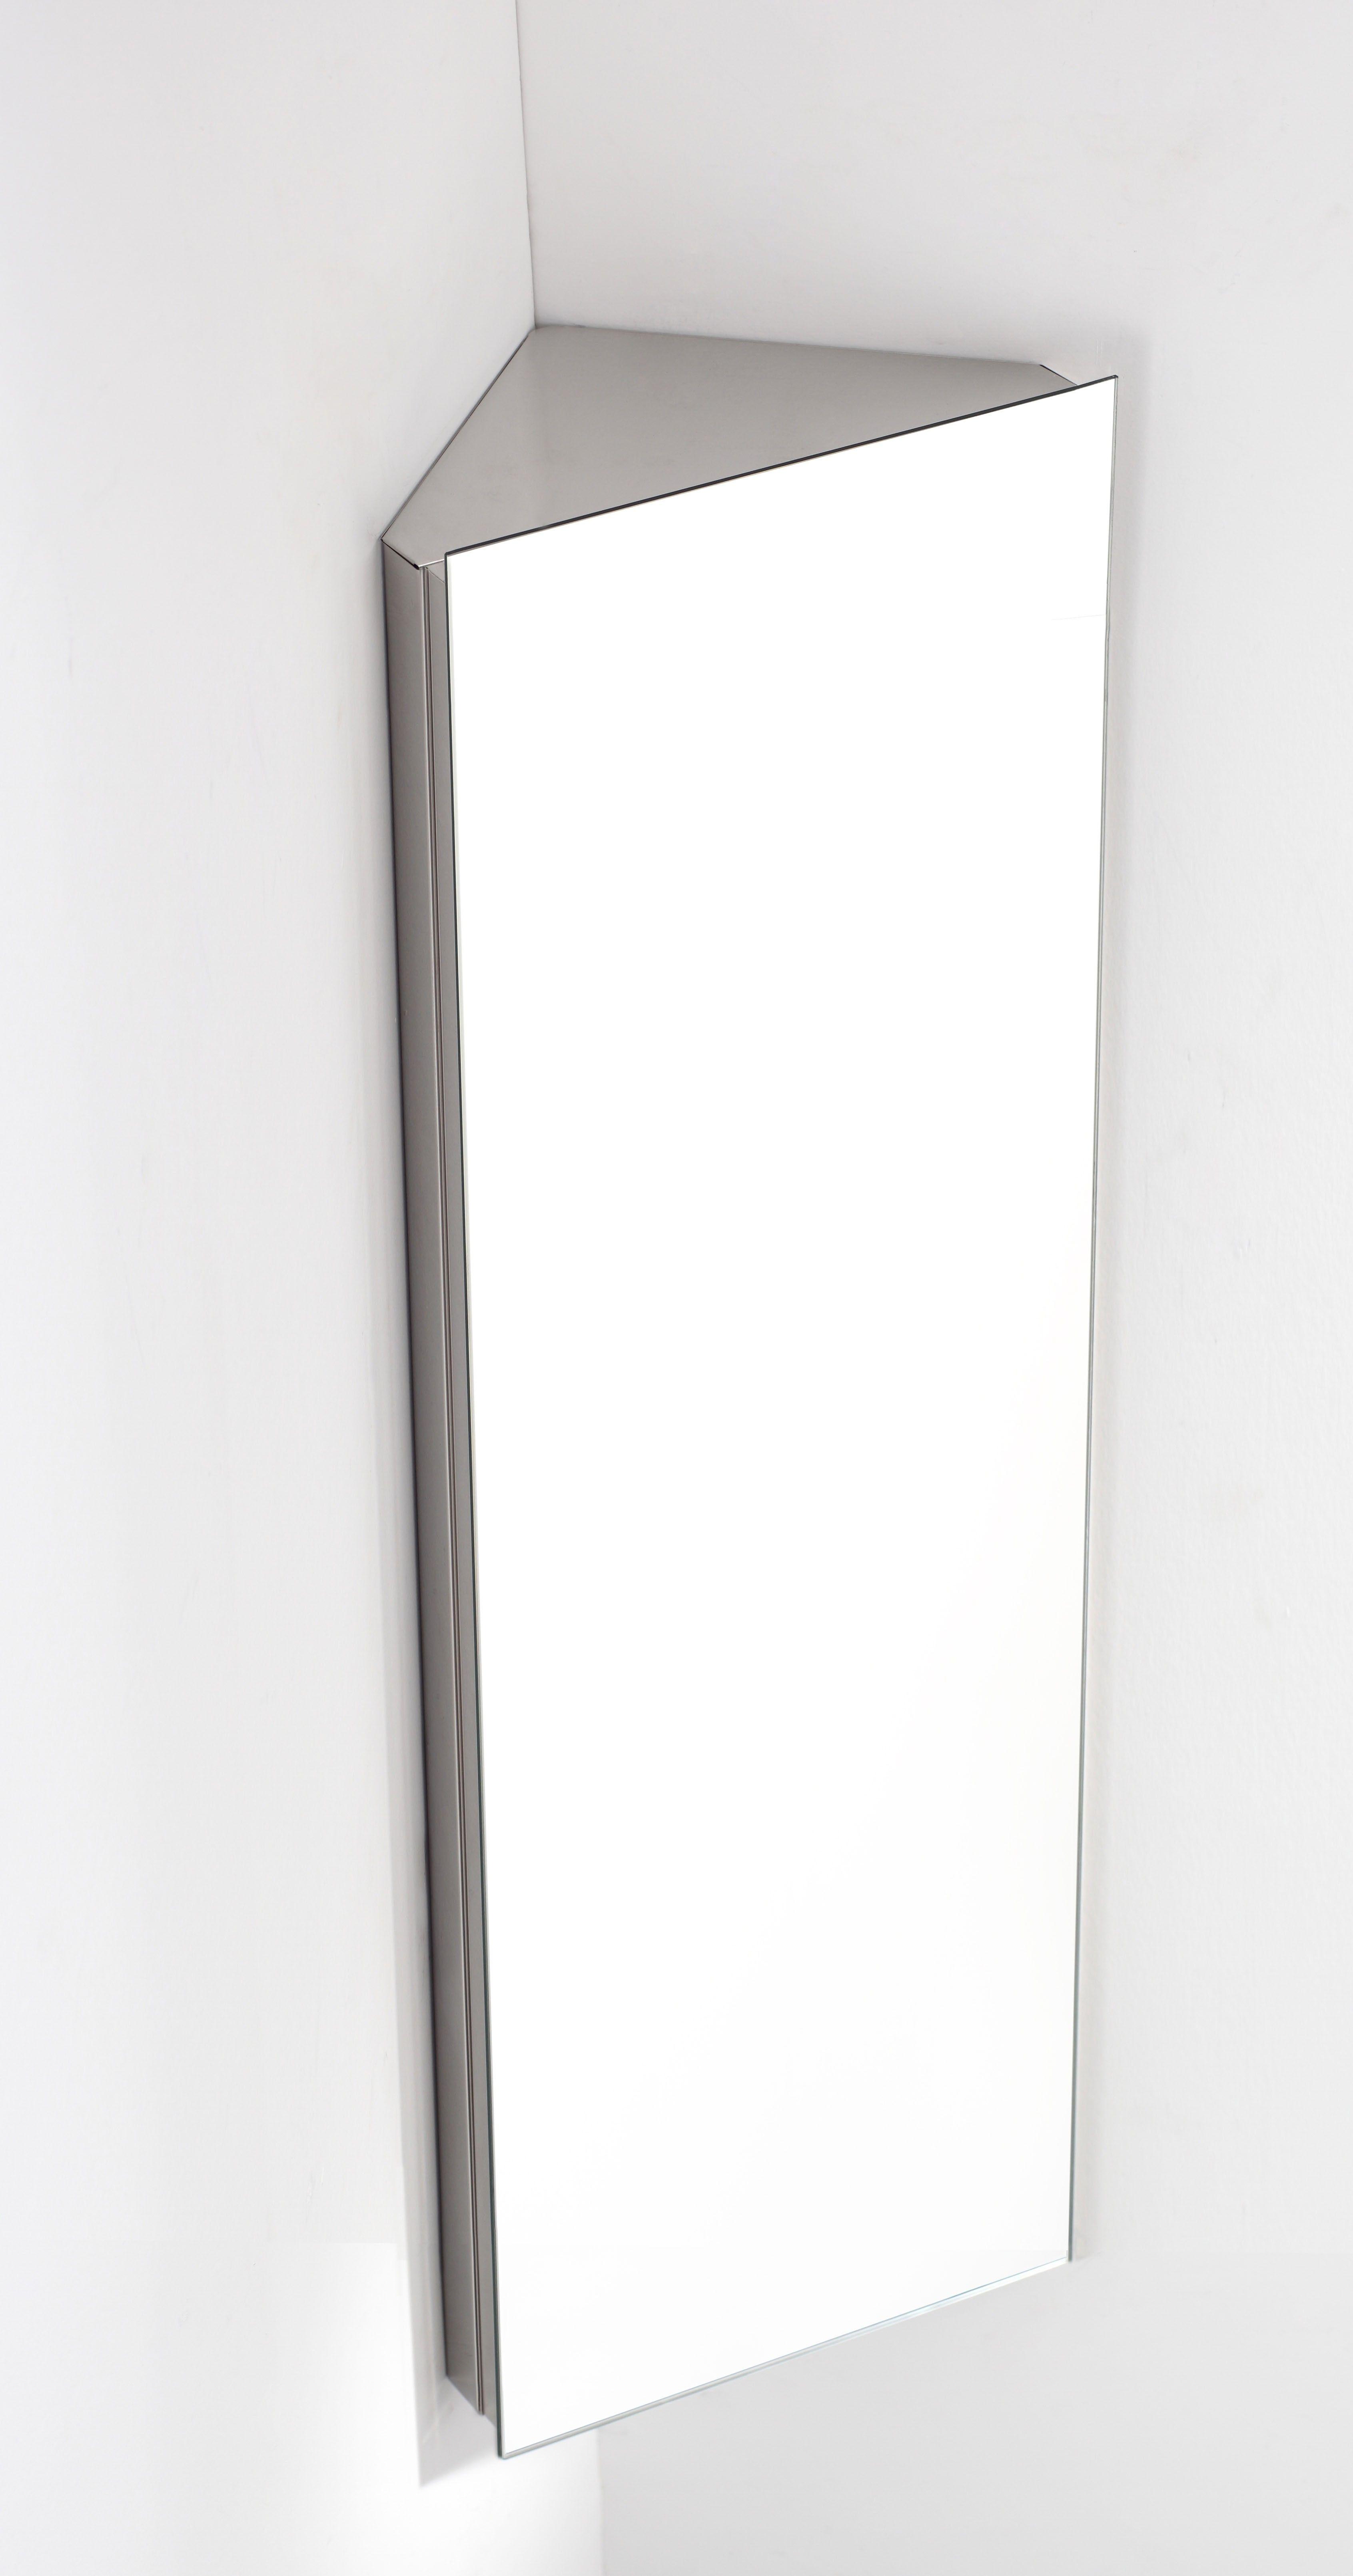 Large Corner Bathroom Cabinet One Tall Mirror Door 1200mm X